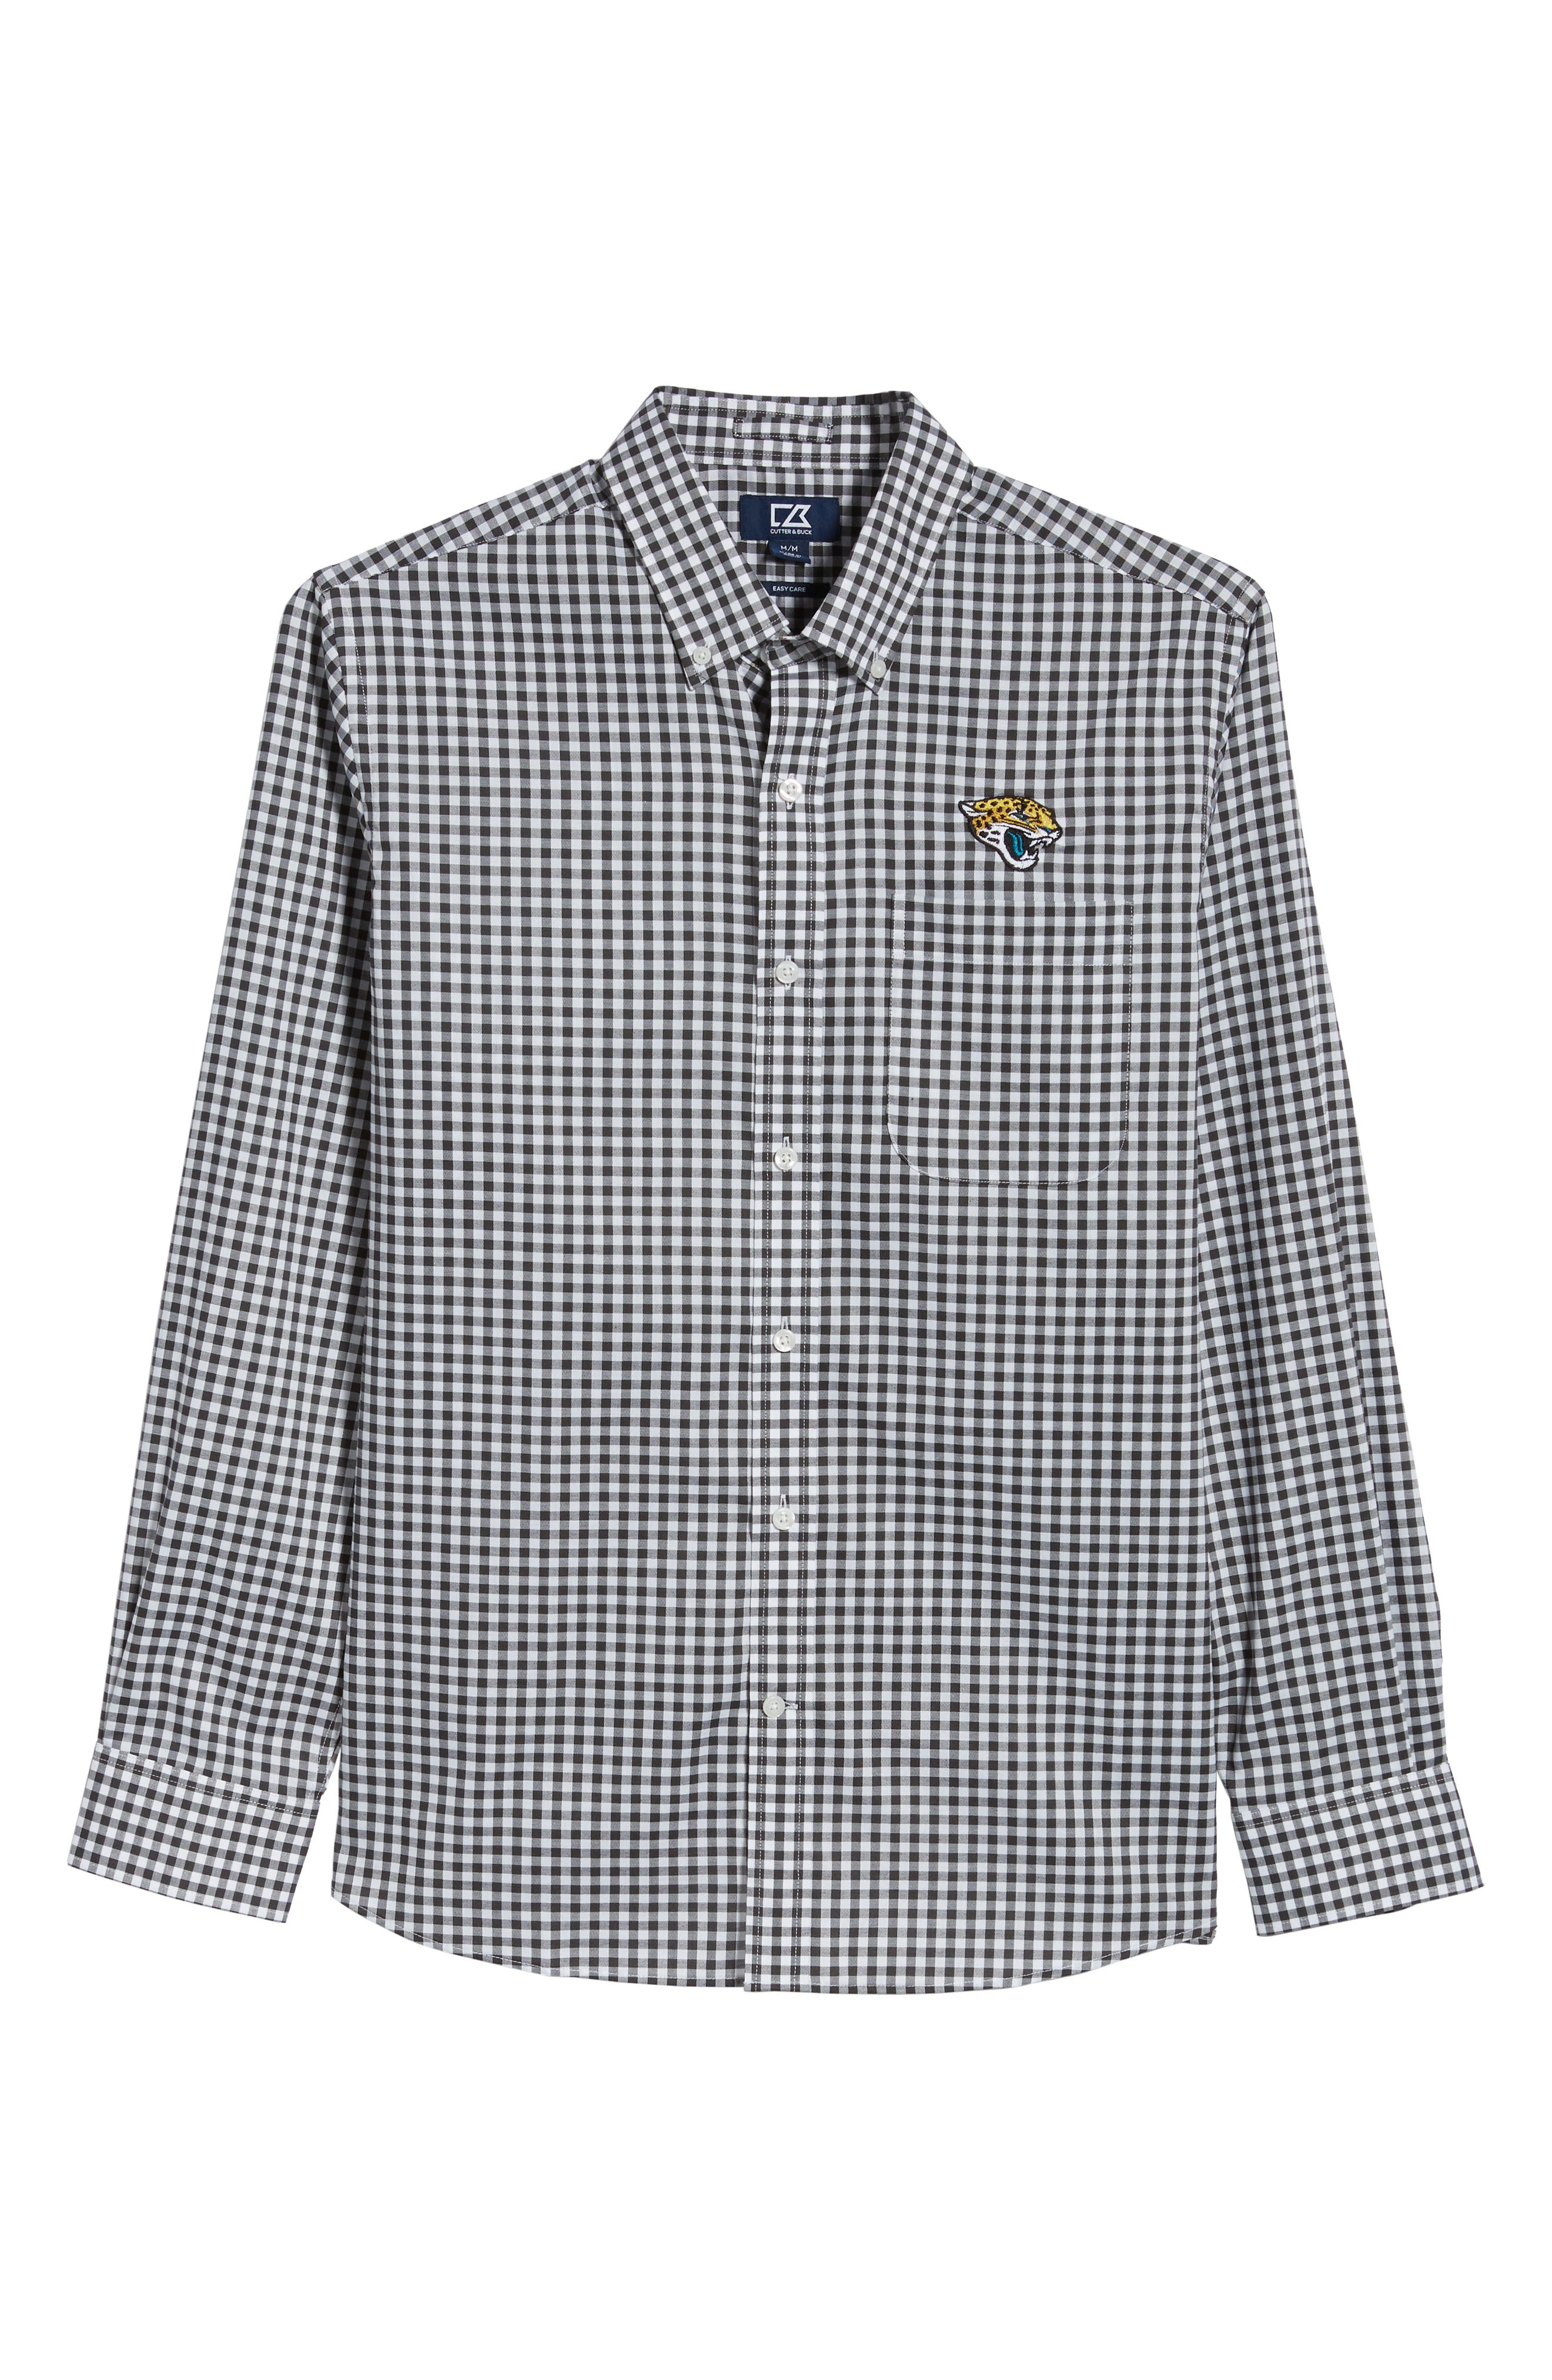 League Jacksonville Jaguars Regular Fit Shirt,                             Alternate thumbnail 6, color,                             CHARCOAL